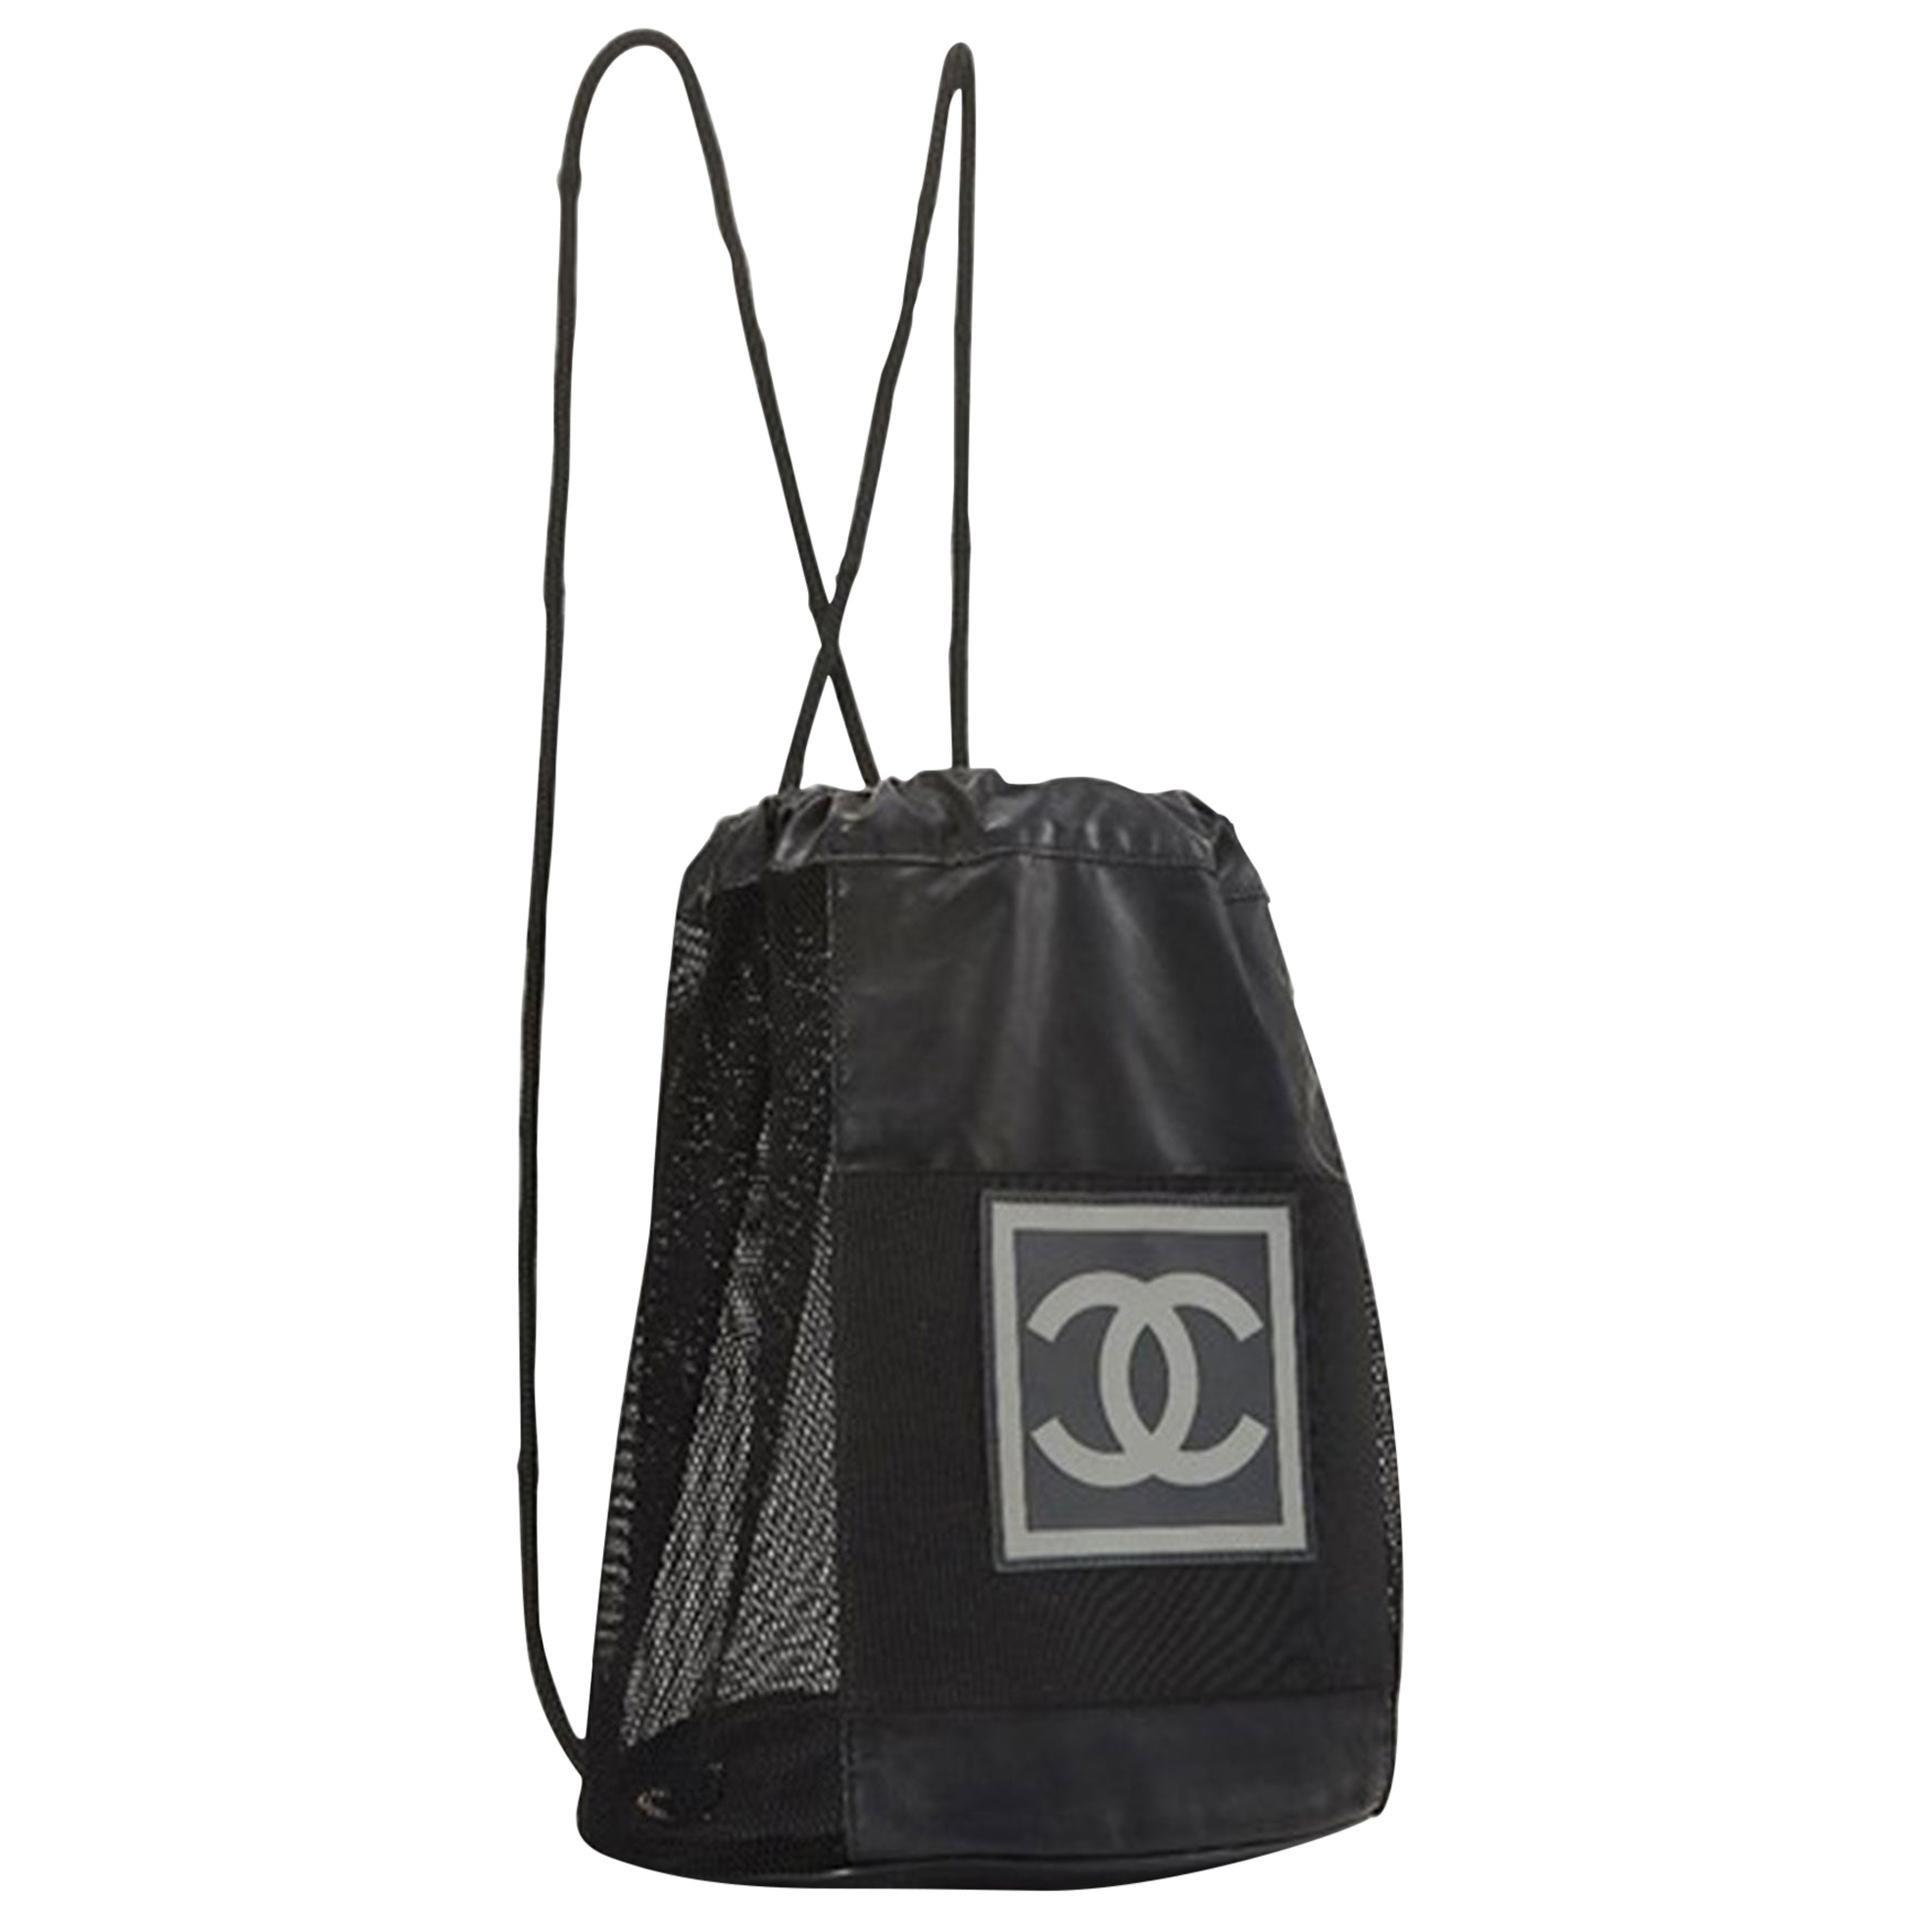 Chanel Shopping Vintage 90s Rare Logo Cc Mesh Sport Tote Black Nylon Backpack